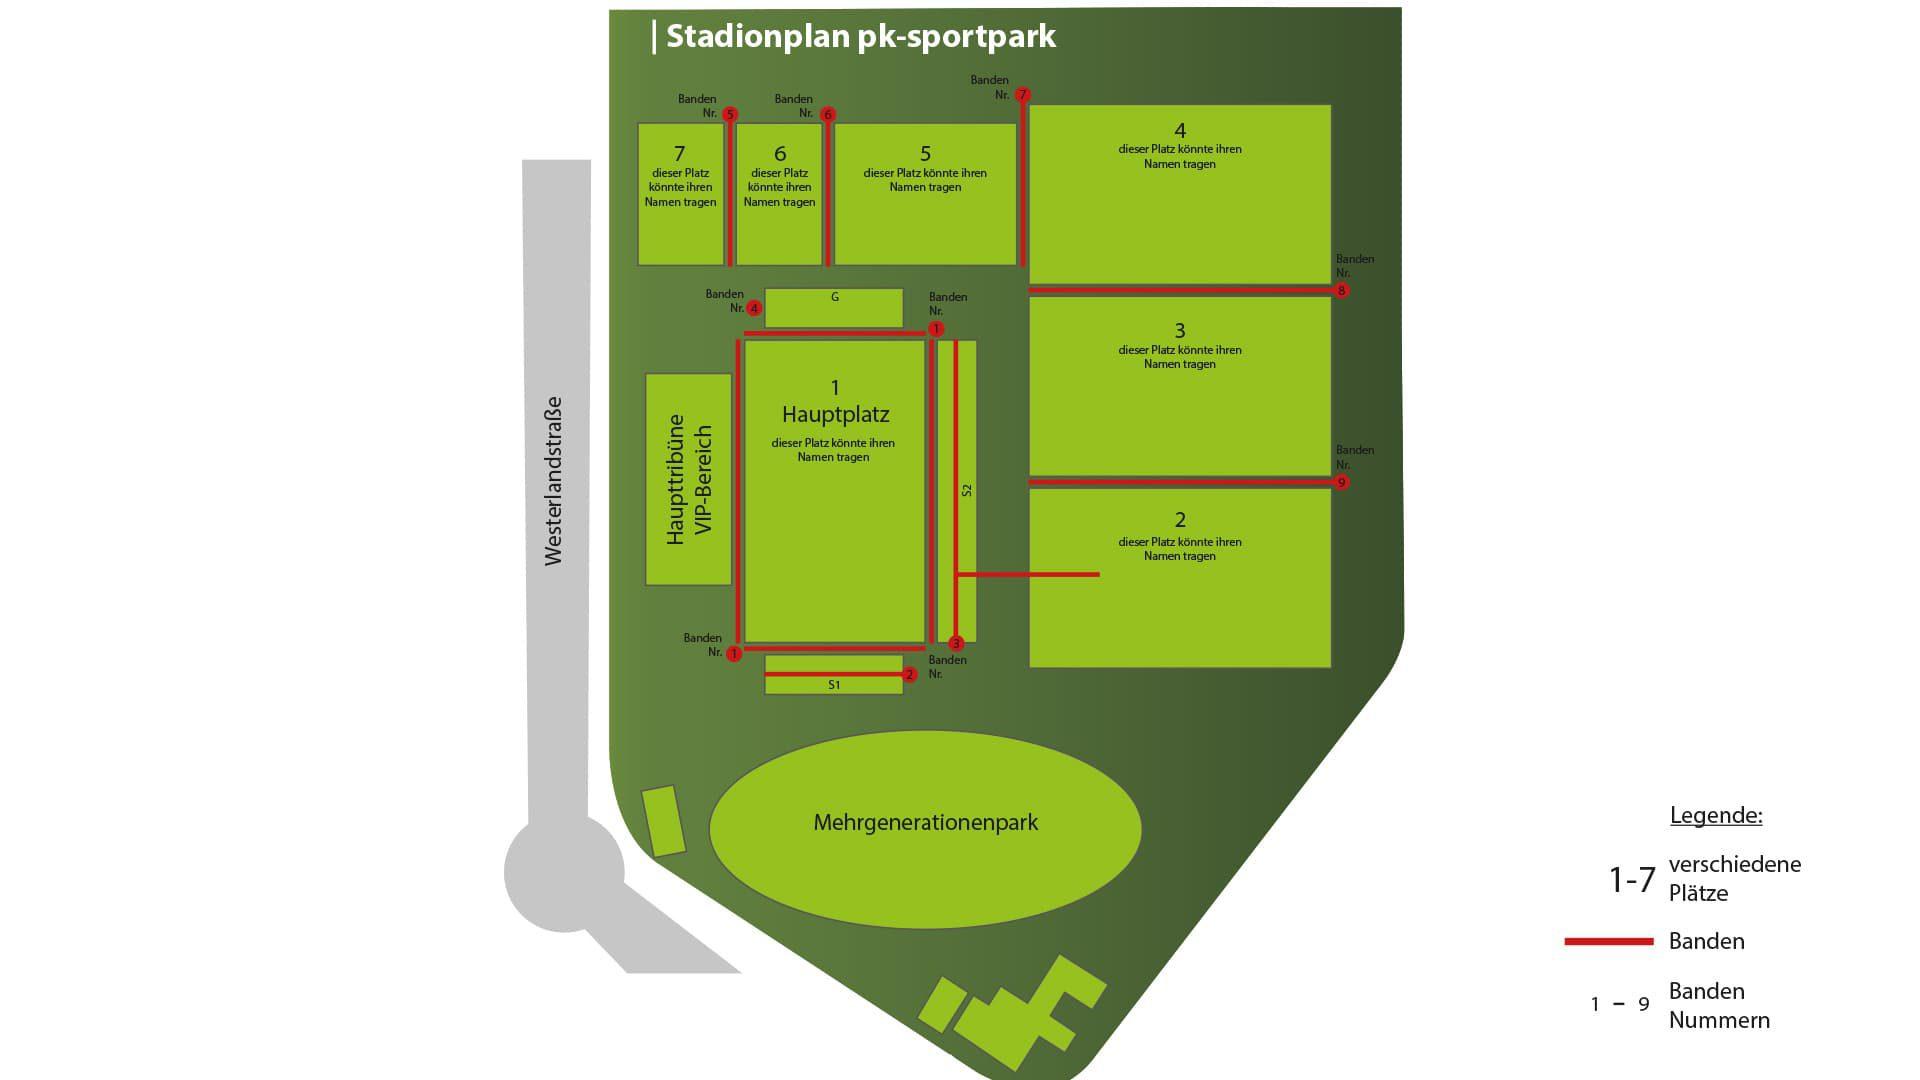 pk-sportpark: stadion des bvc